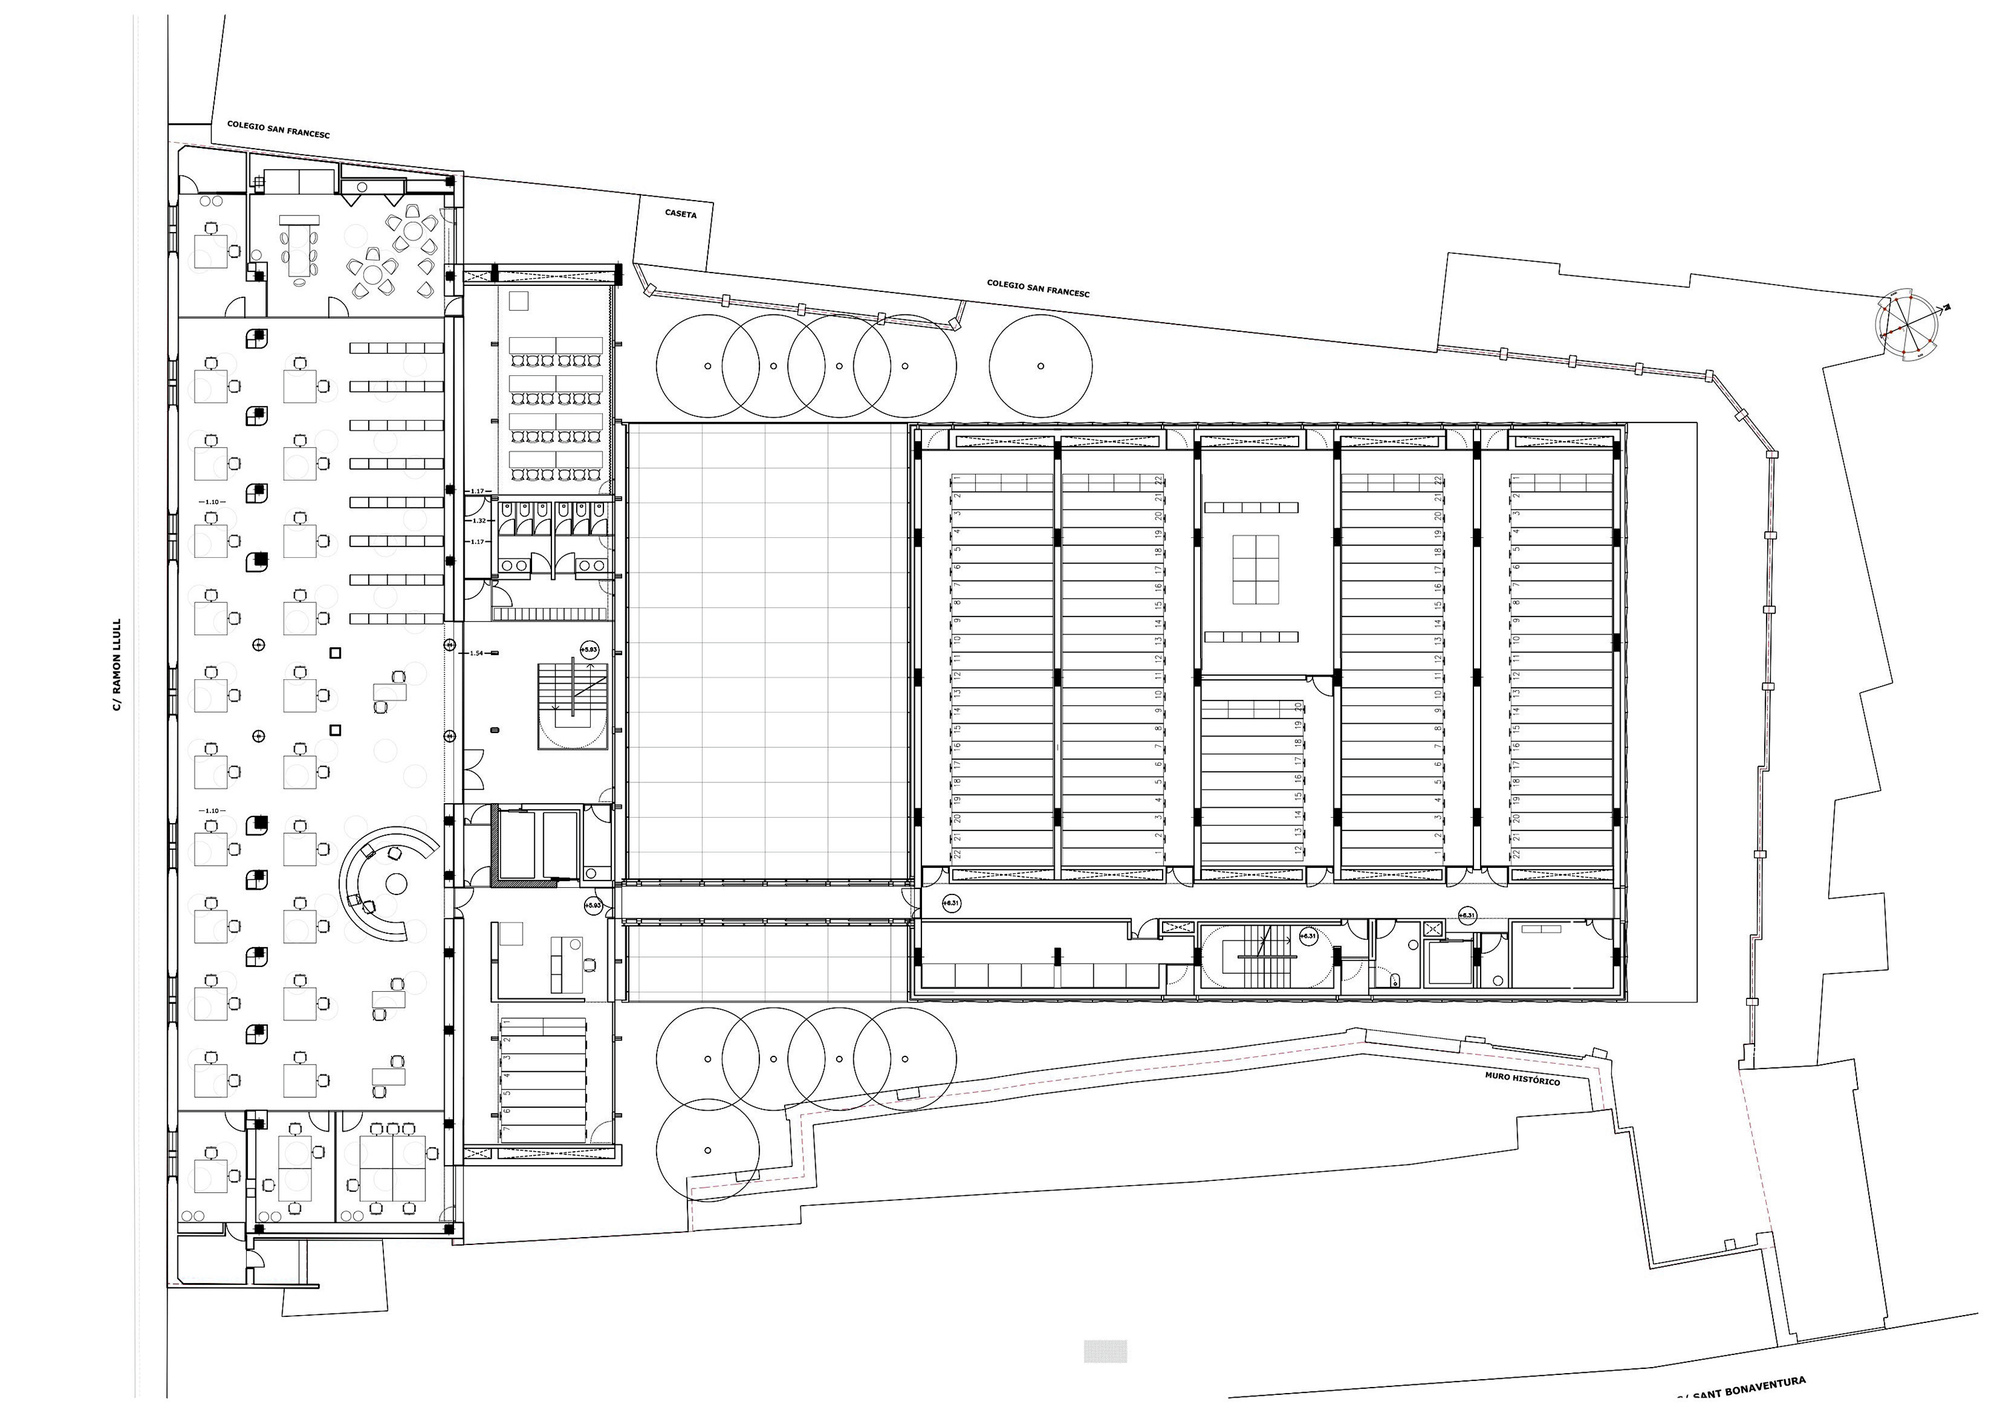 Galeria de os arquivos do reino de mallorca estudio de for Arquitectura 5 de mayo plan de estudios